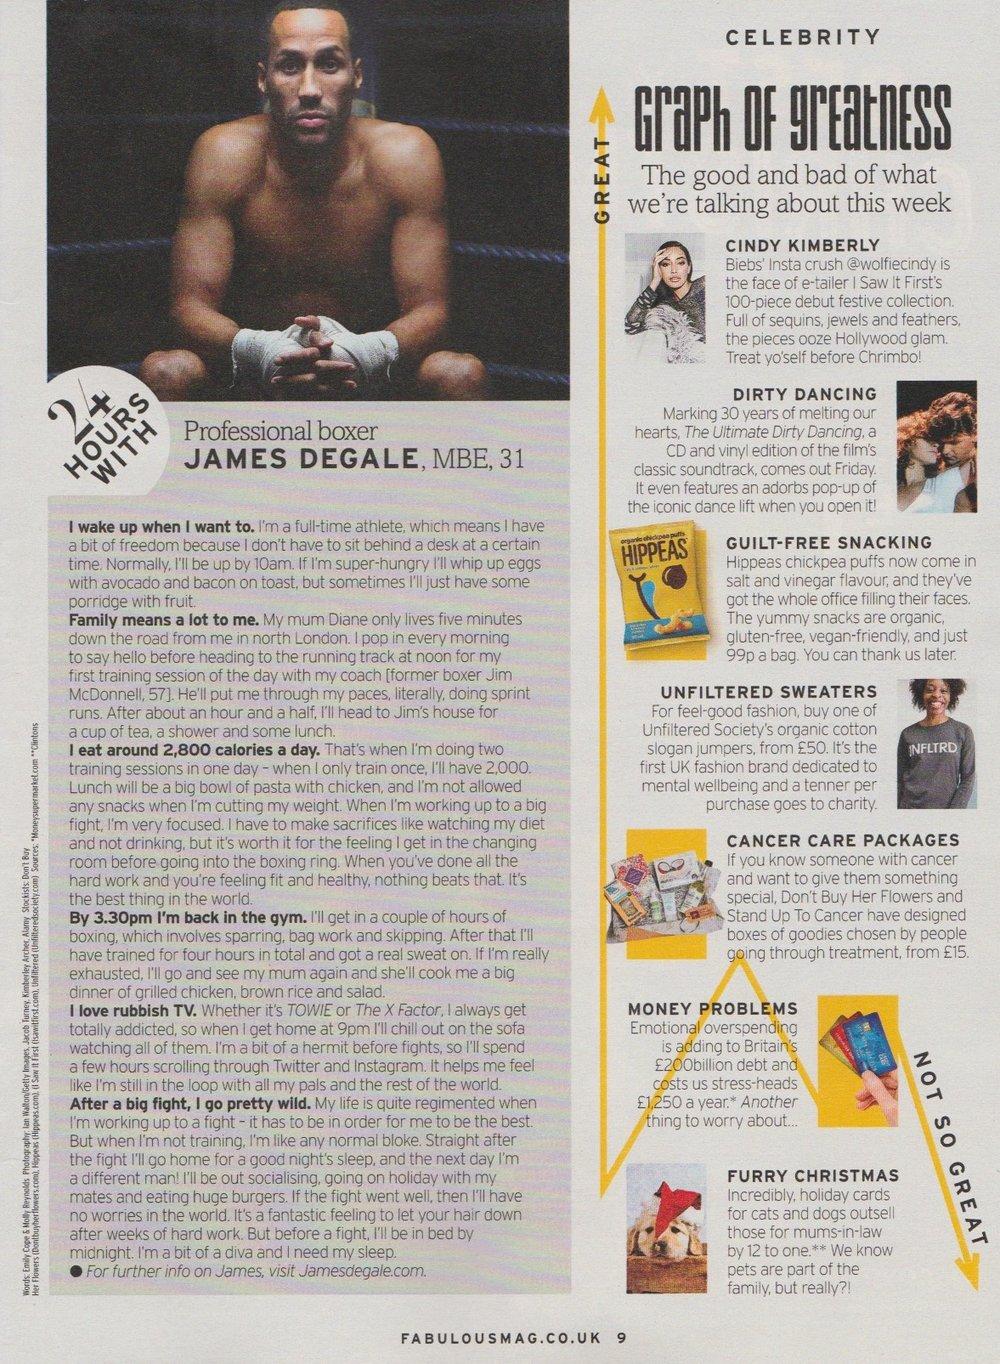 Fabulous Magazine 26:11:17 DBHF.jpeg